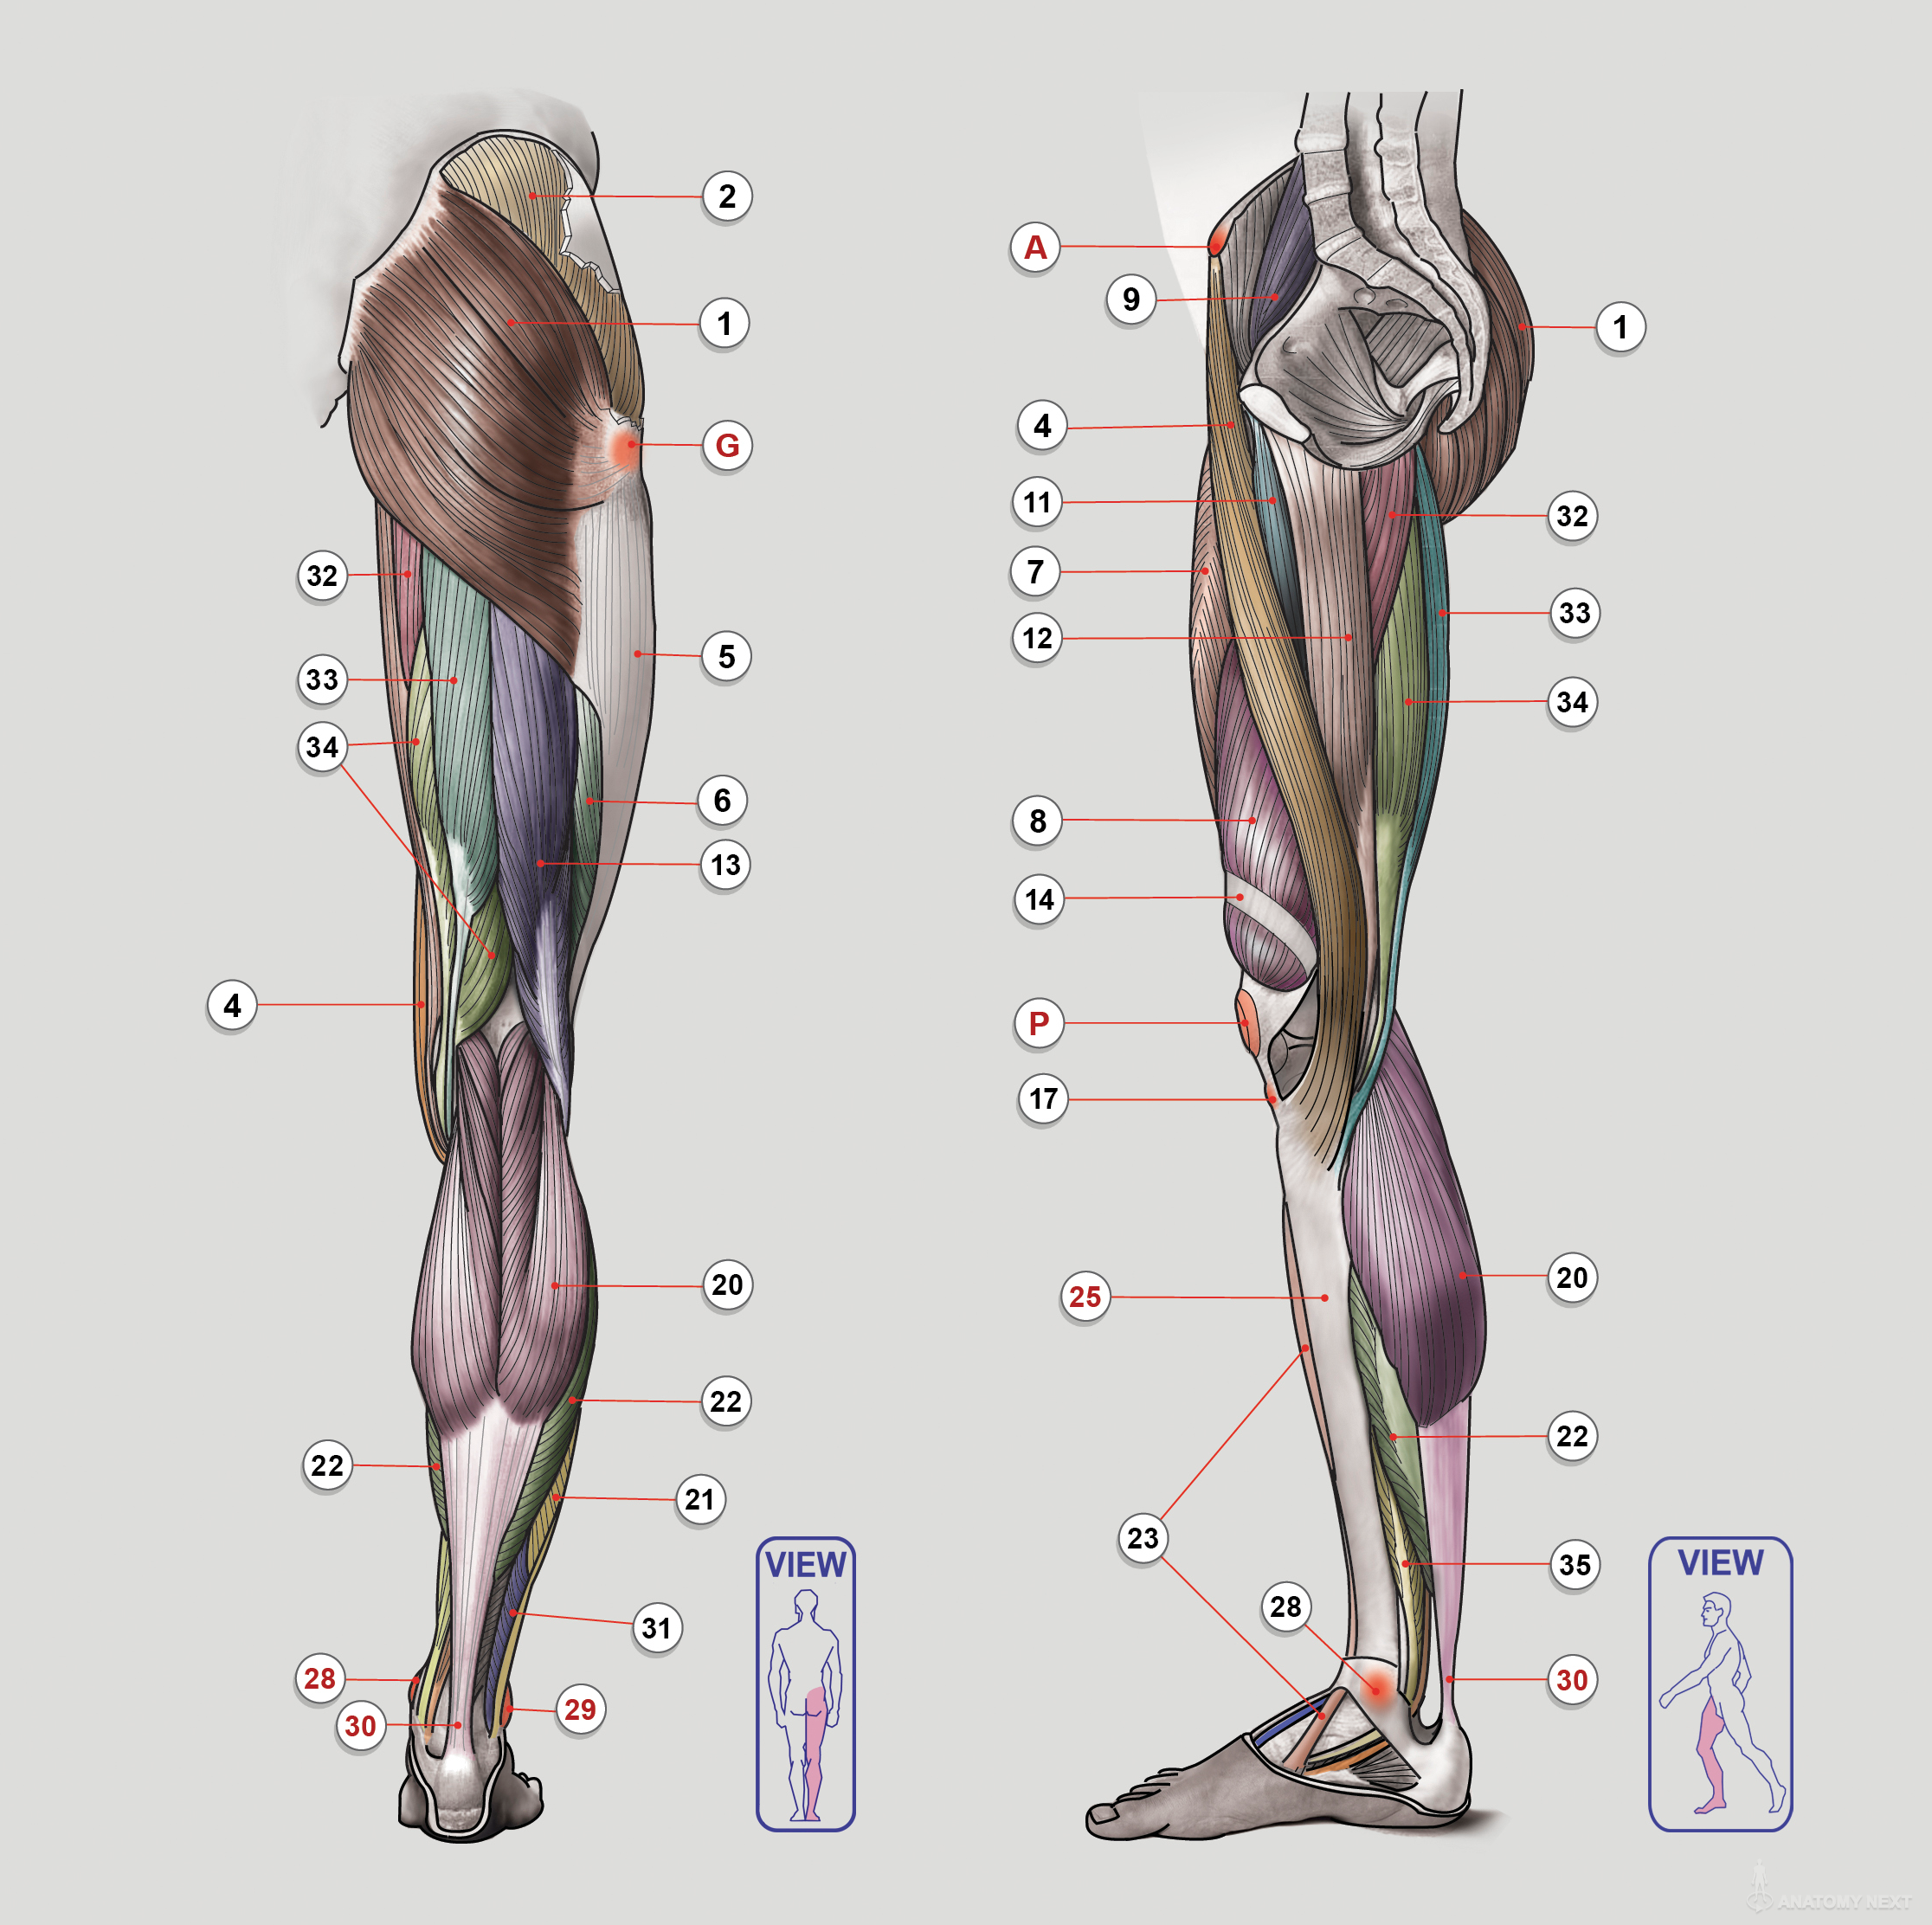 Anatomy Next - Anatomy of Lower limb: Anatomy & features | Anatomy ...